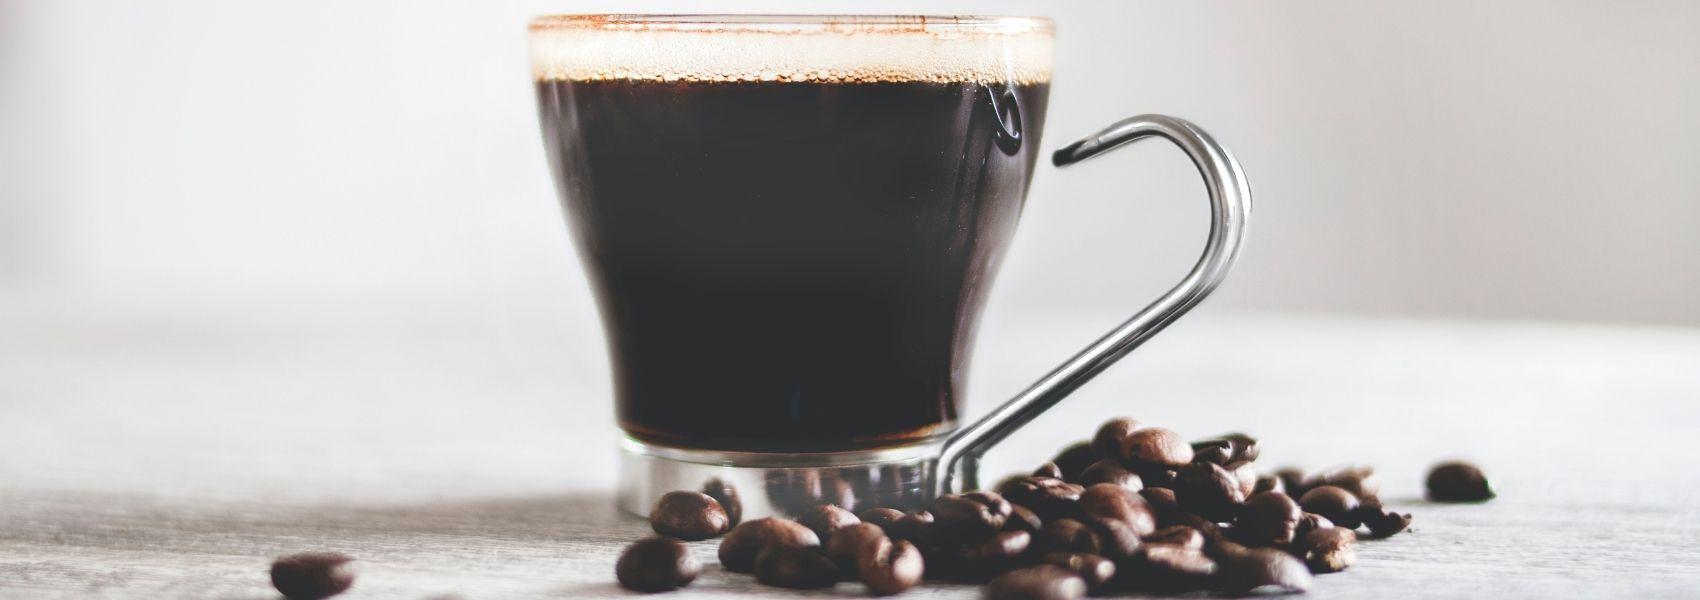 Consumo elevado de cafeína pode estar associado a maior risco de glaucoma